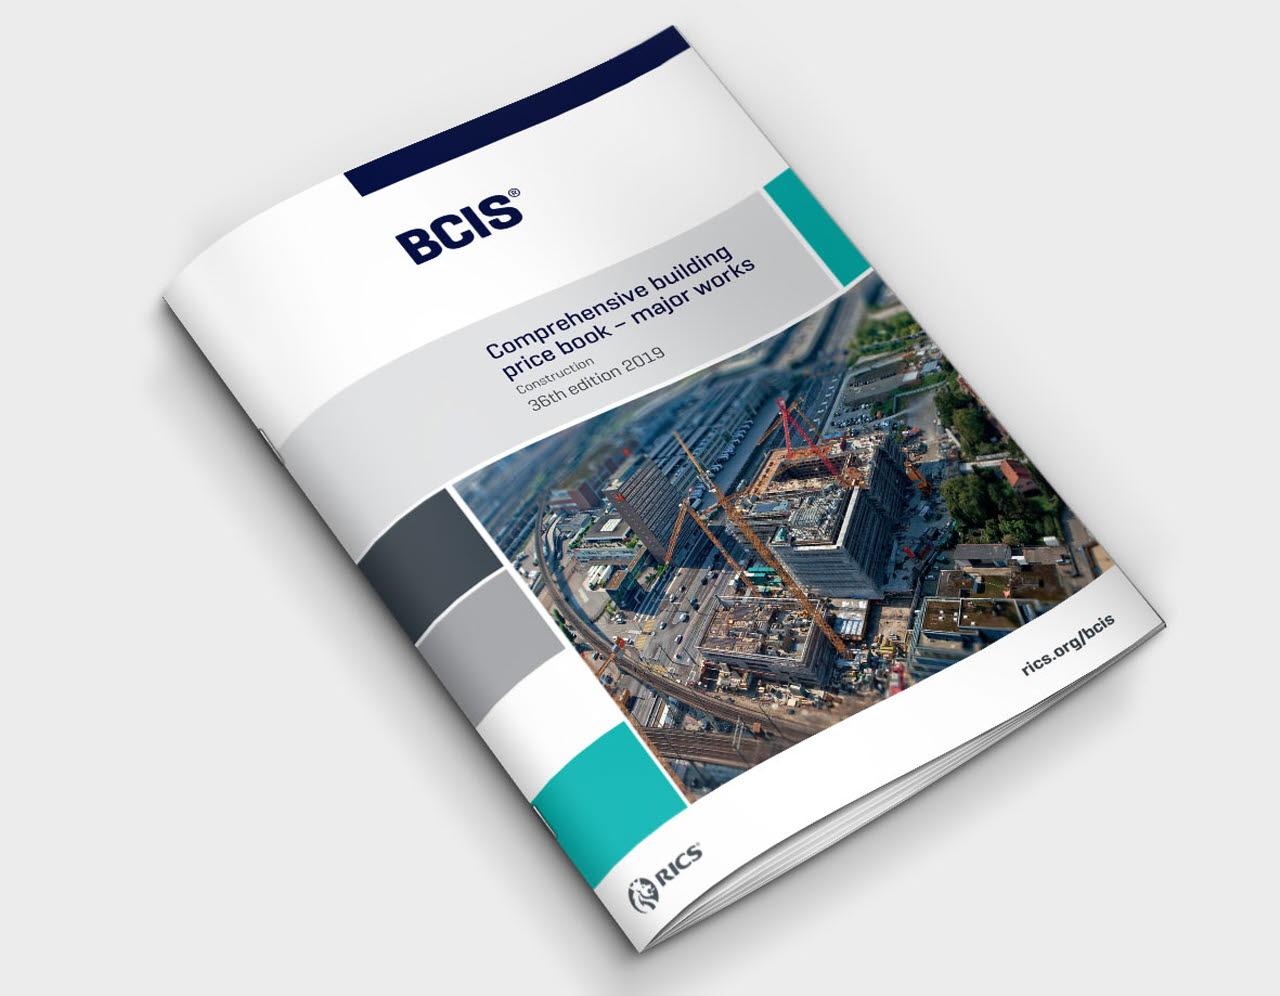 BCIS Price Book